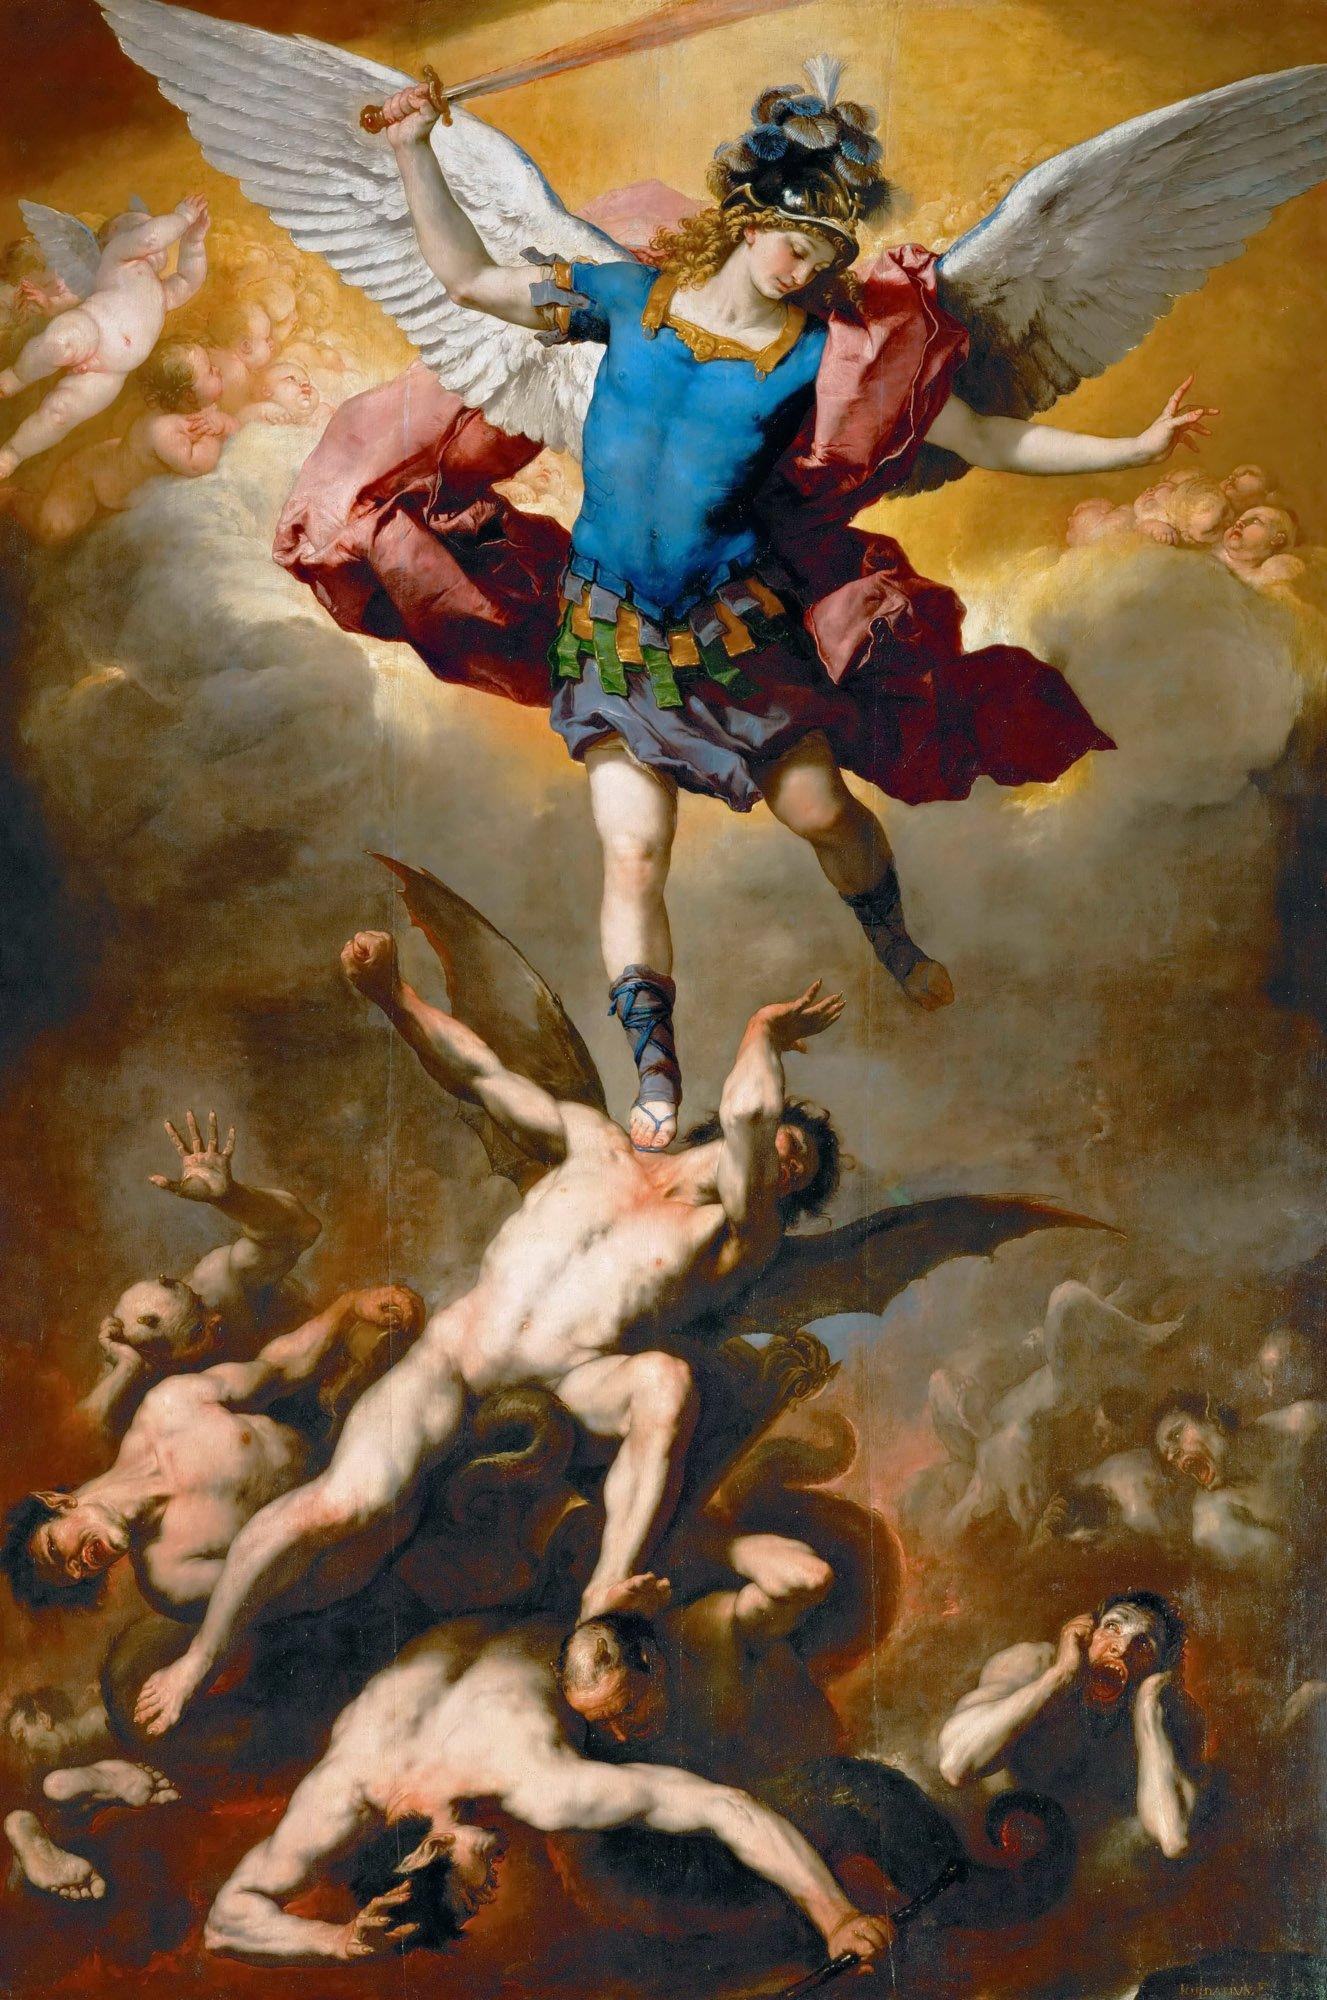 bernard of clairvaux guardian angels october 2